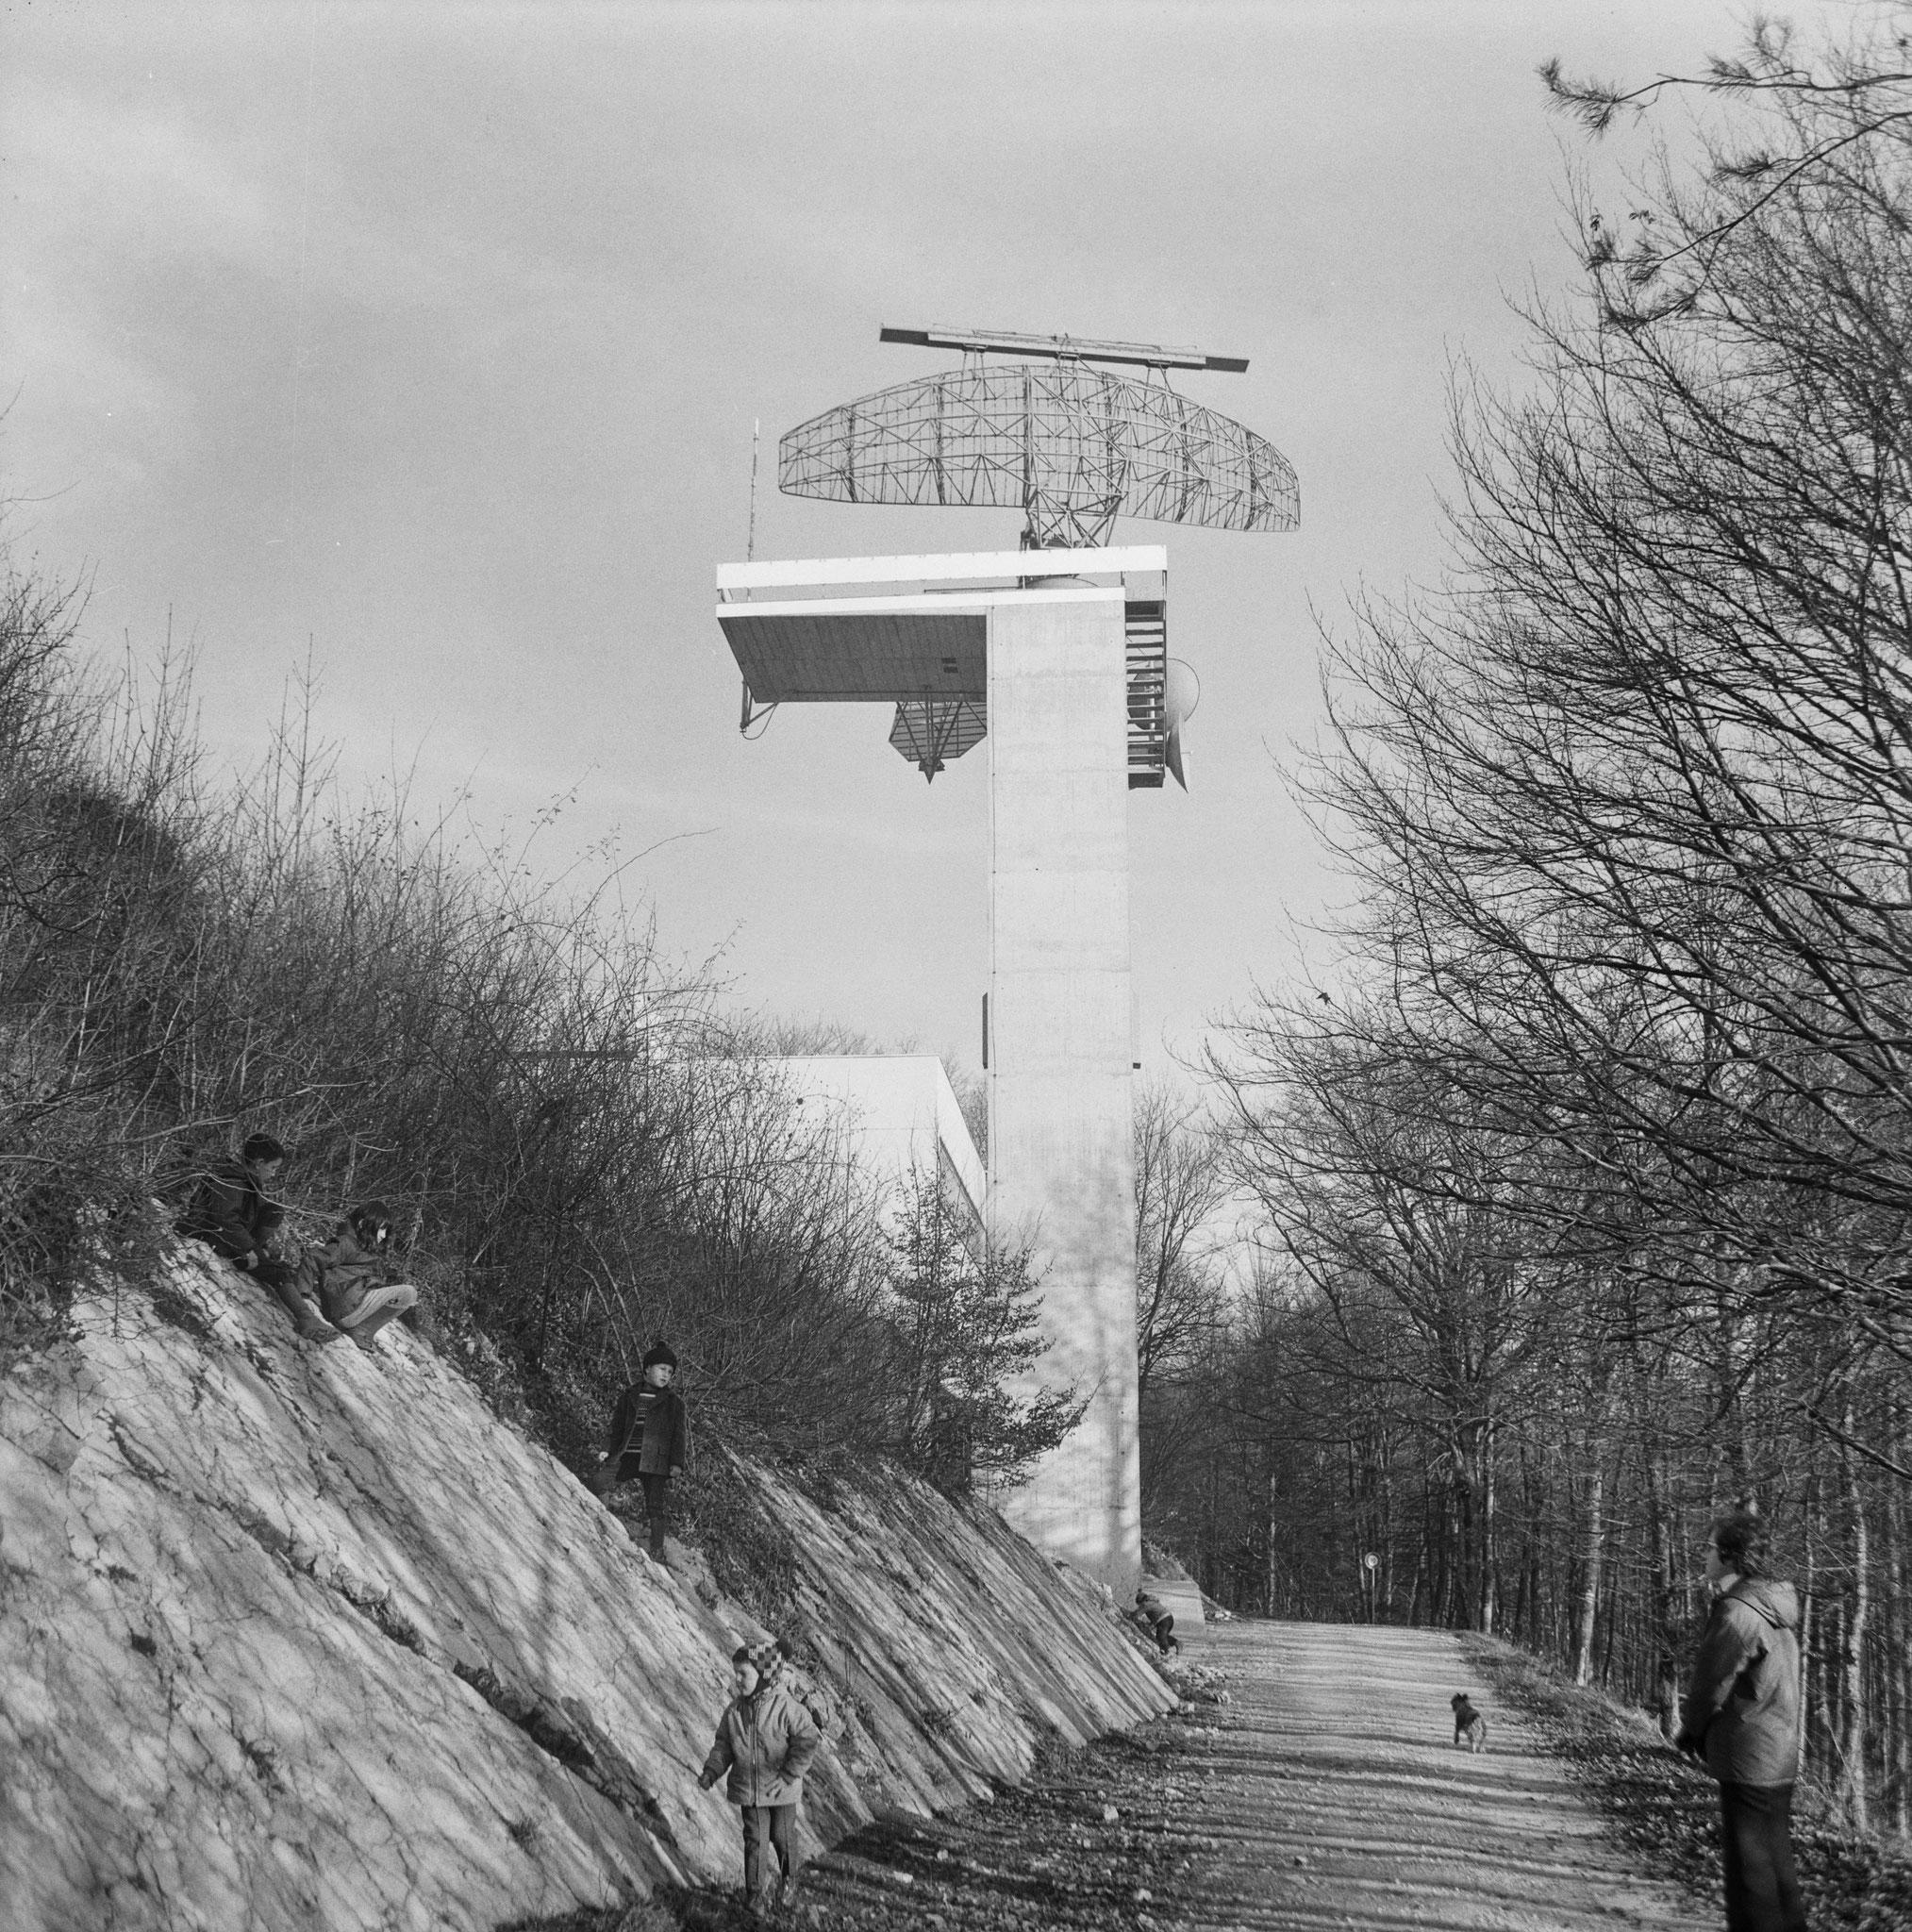 1959-1979::Erster Radarturm mit ungeschütztem Radar::Foto 30.11.1969::ETH-Bibliothek Zürich, Bildarchiv / Fotograf: Wyss, Max A. / Com_M18-0100-0002 / CC BY-SA 4.0